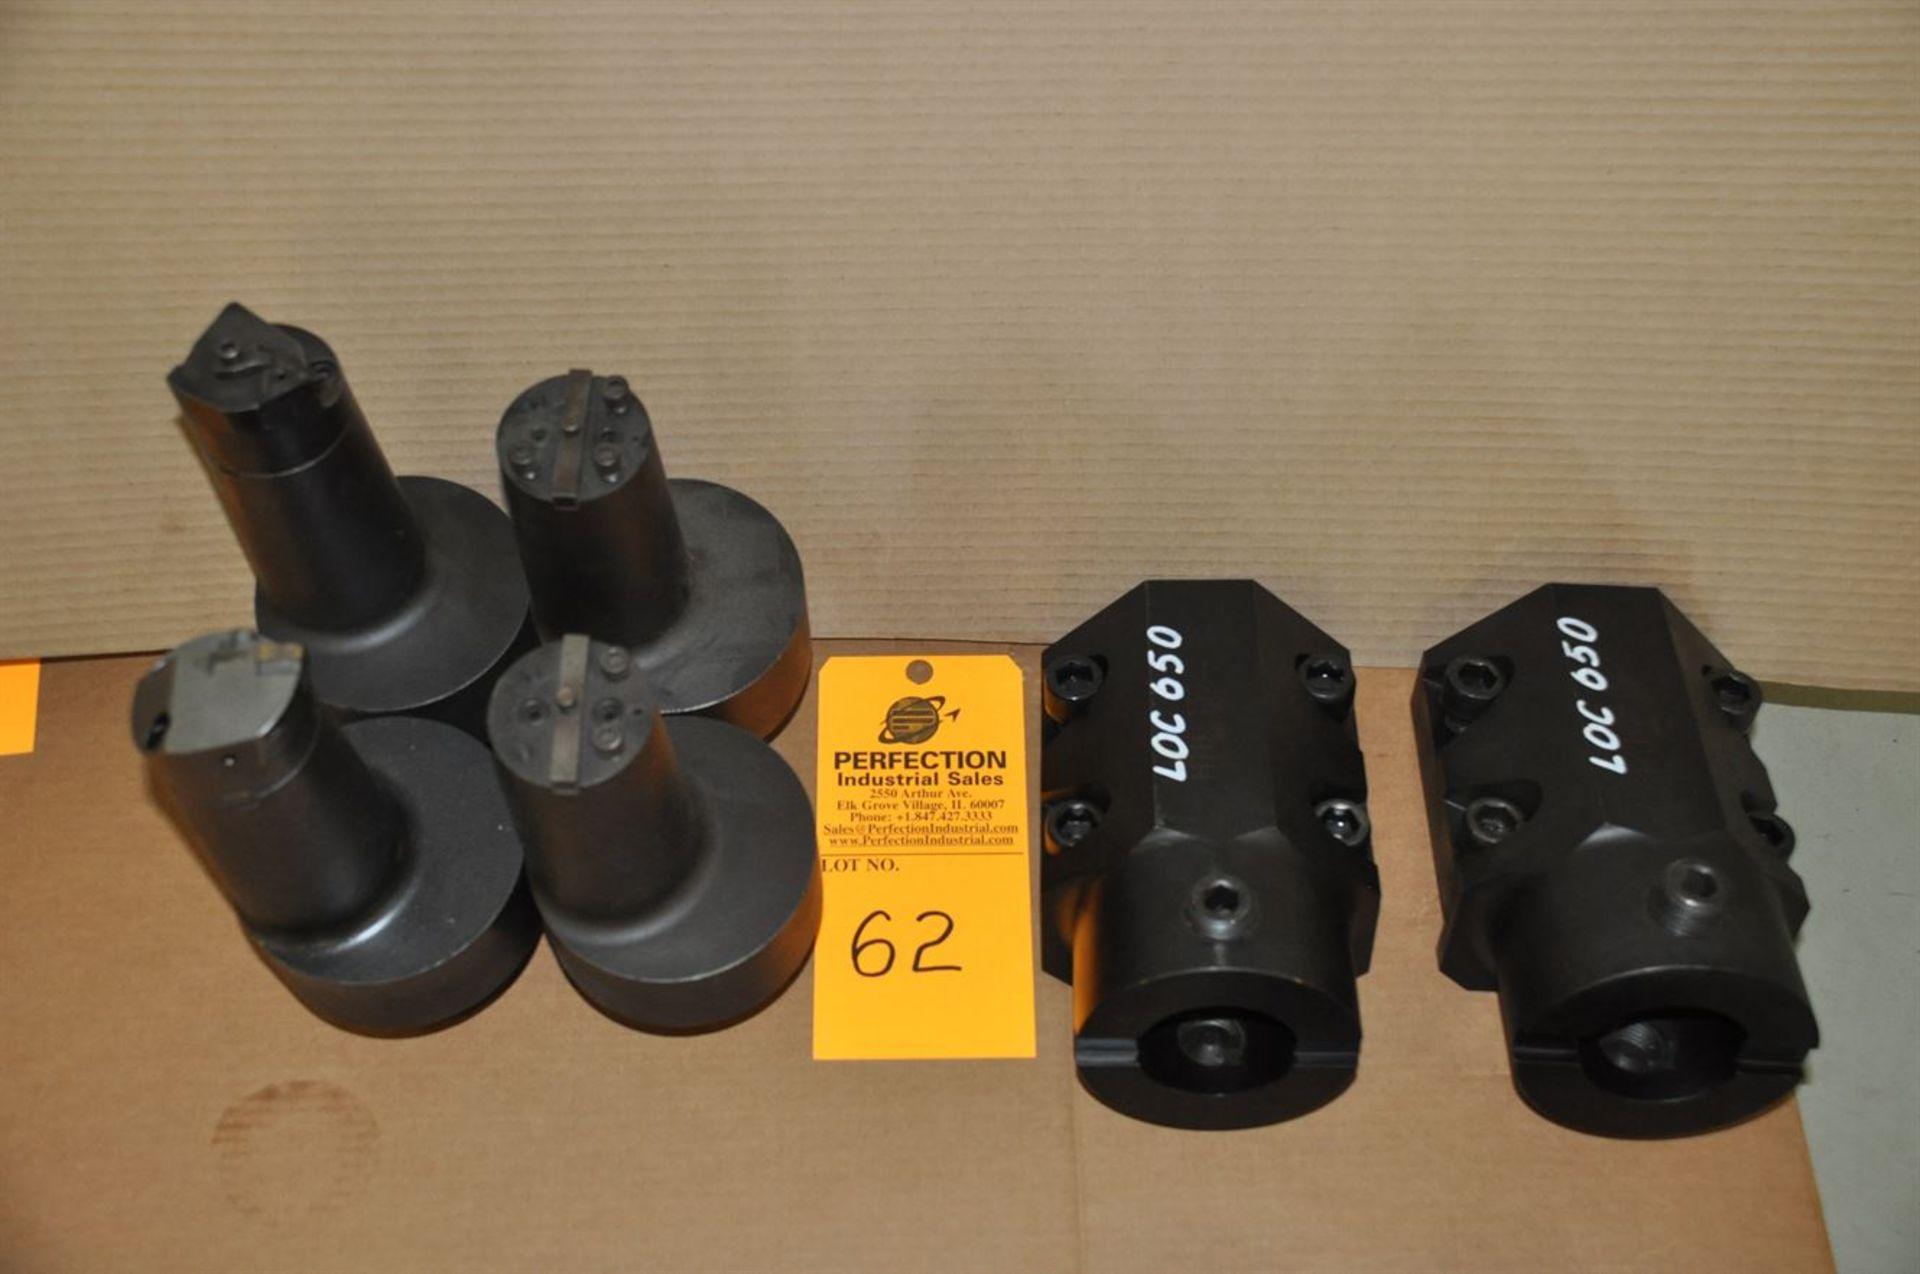 "(2) LOC 650 High Tech tool holders (4) off-set boring bars, fits 2.5"" heads"